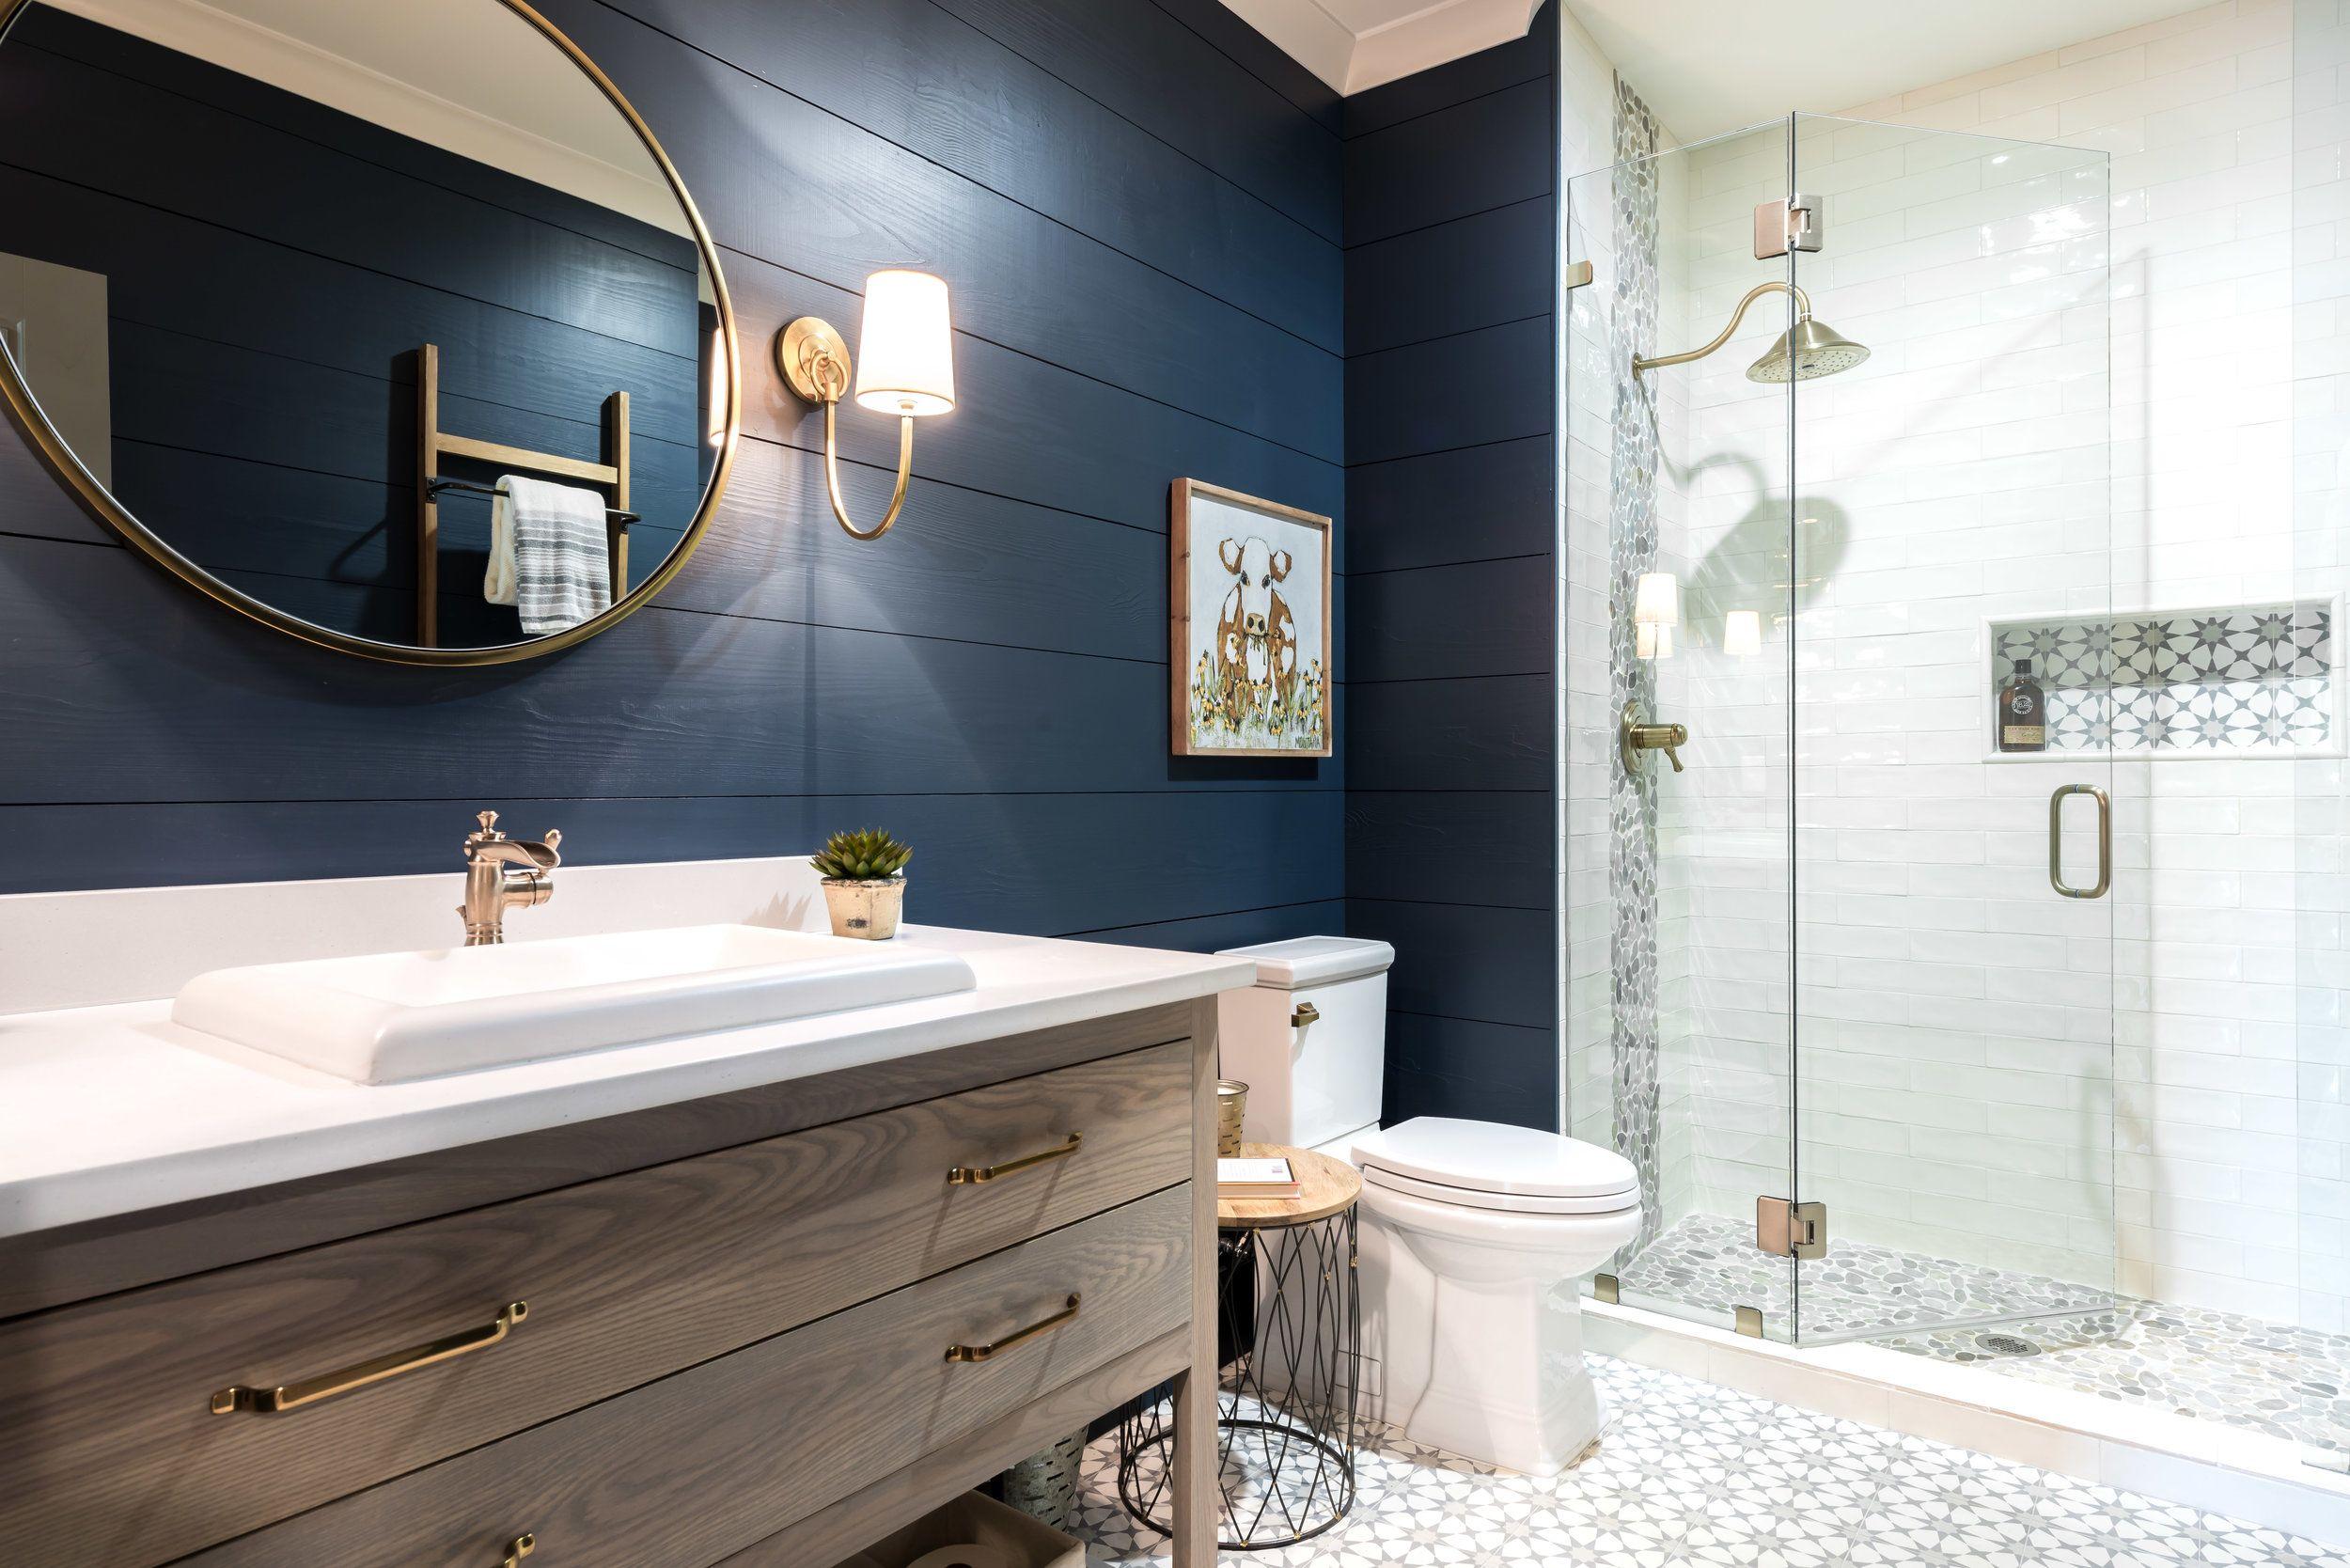 Hart Lock Bathroom Salle De Bain Noir Et Blanc Decoration